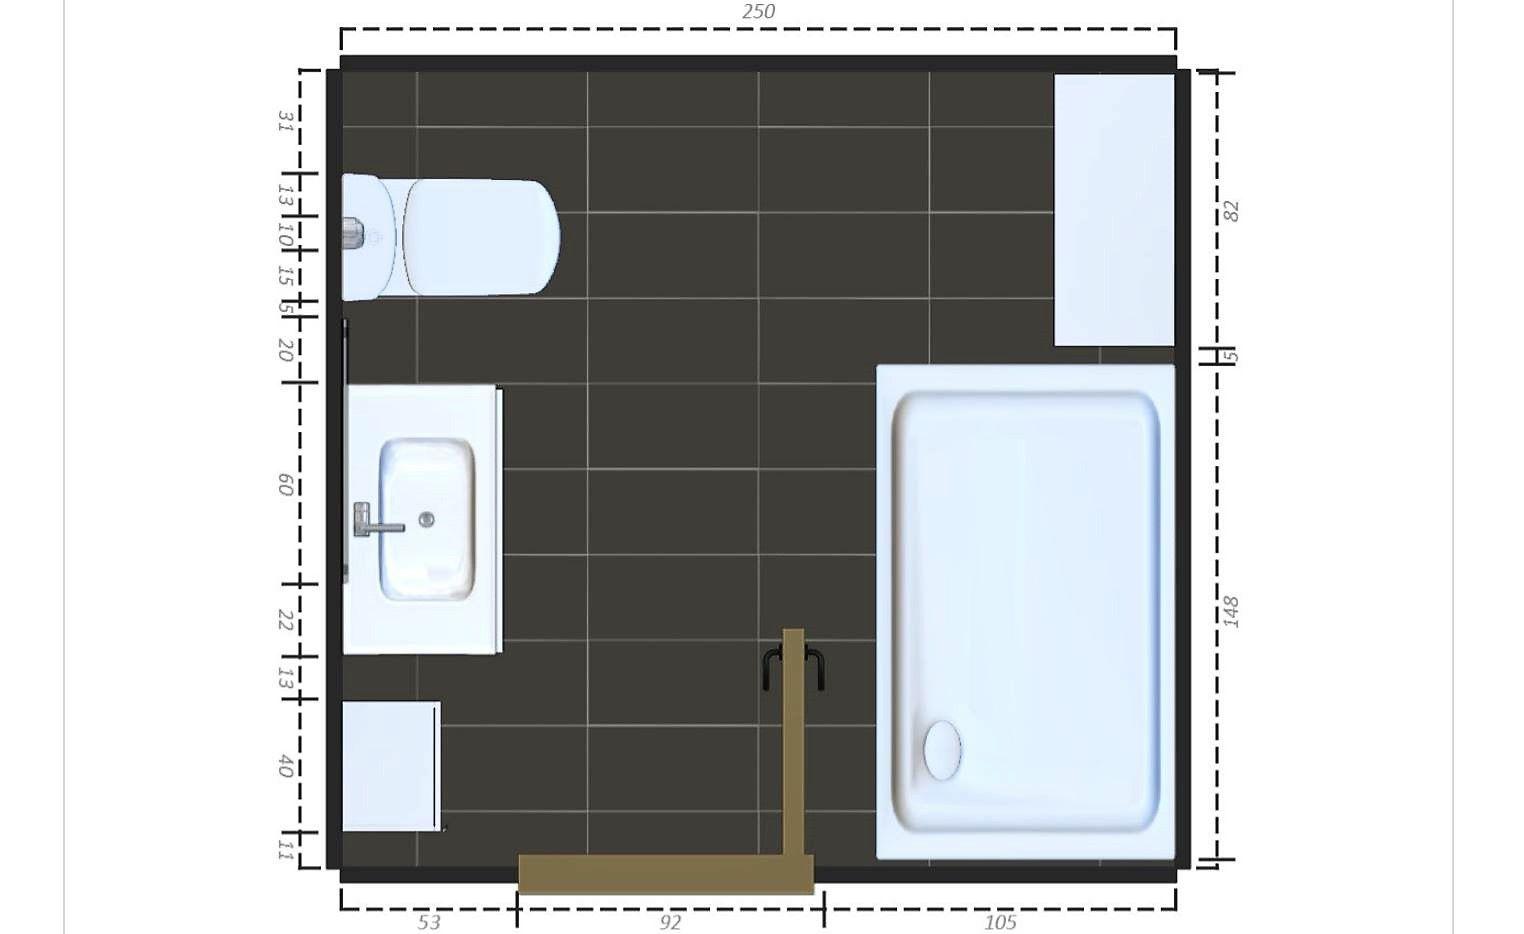 Bathroom Layout For 4 X 7 4 x 7 bathroom layout